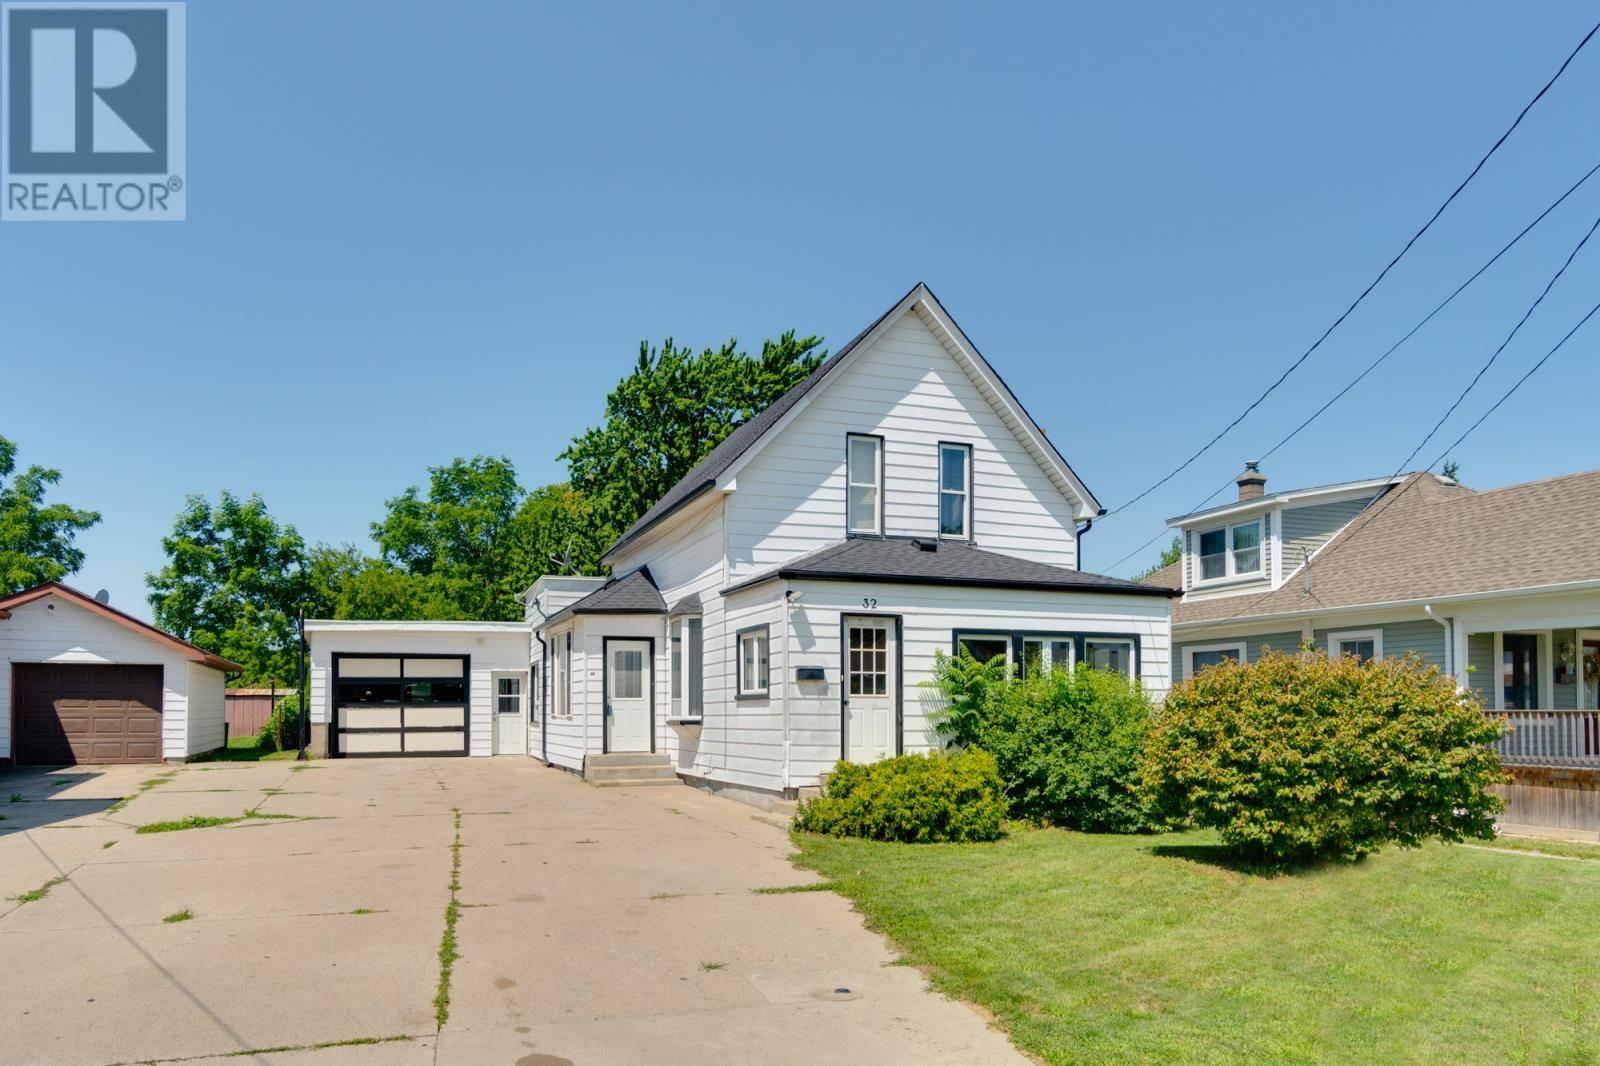 House for sale at 32 Elliott  Leamington Ontario - MLS: 19023603